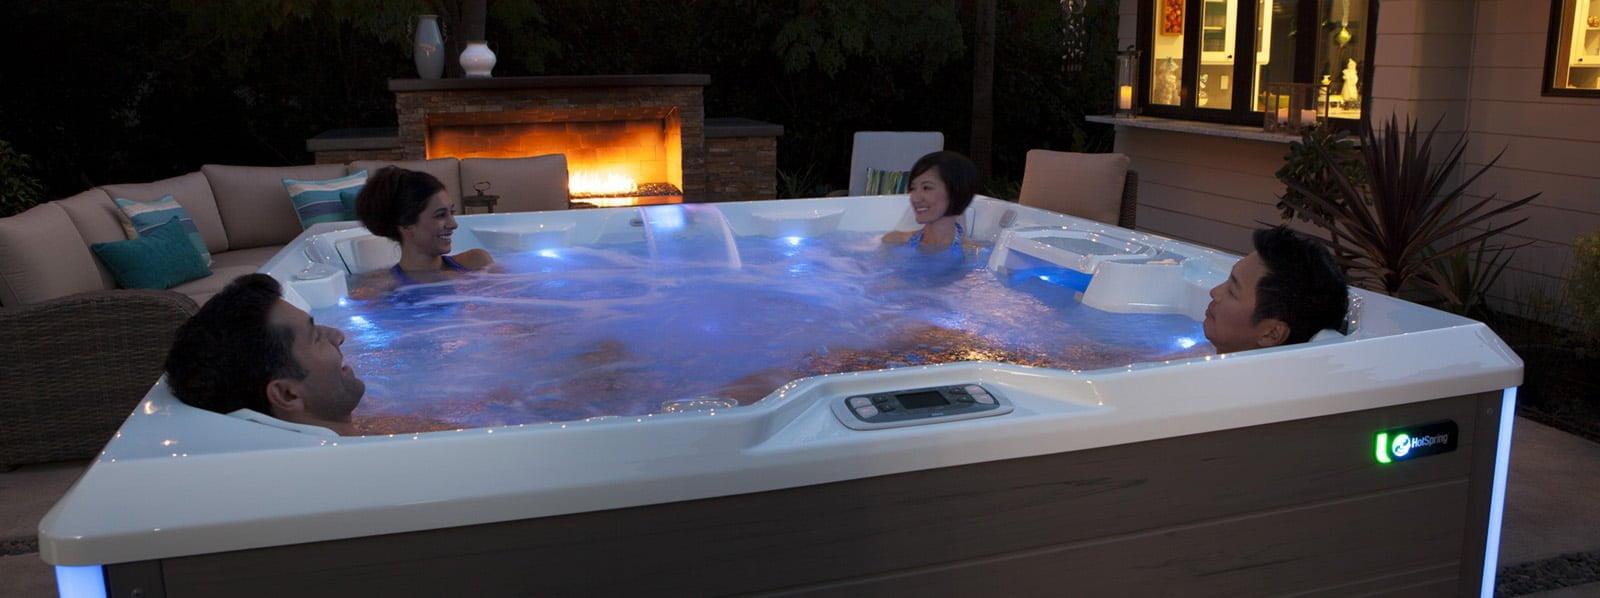 hot-spring-limelight-hero-image Наружные SPA ванны